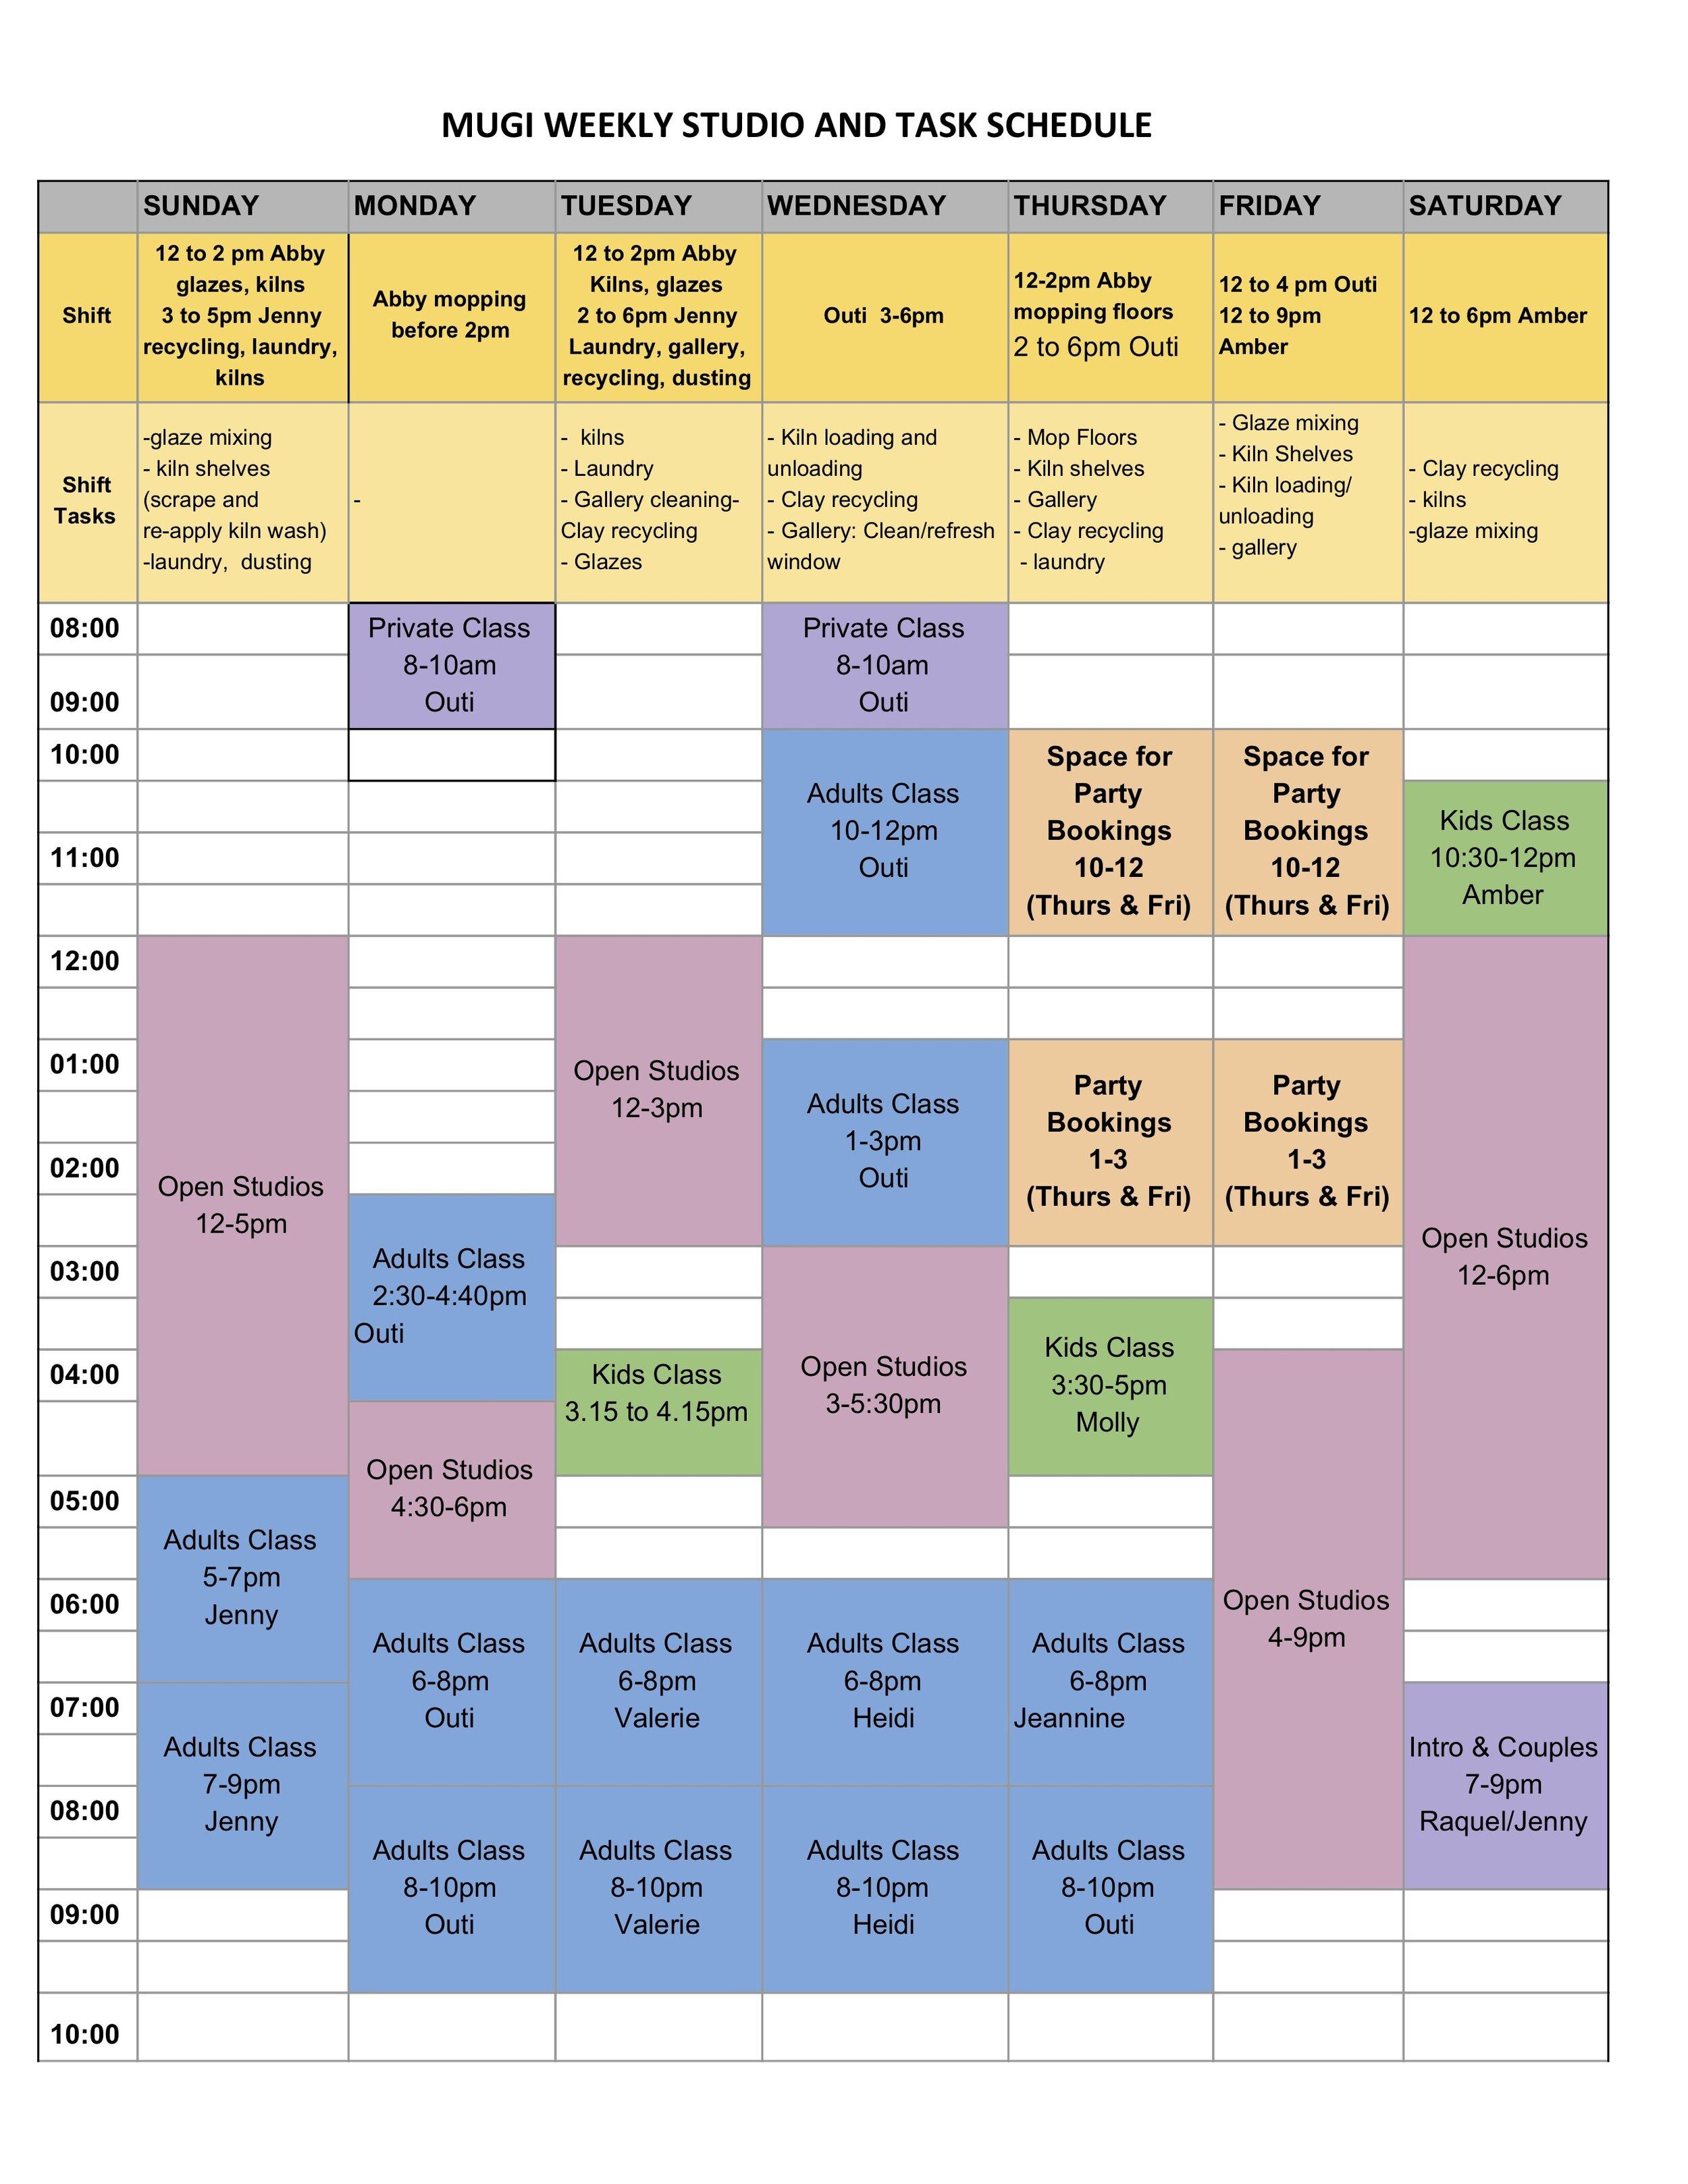 The following studio calendar was updated 10/17/2019